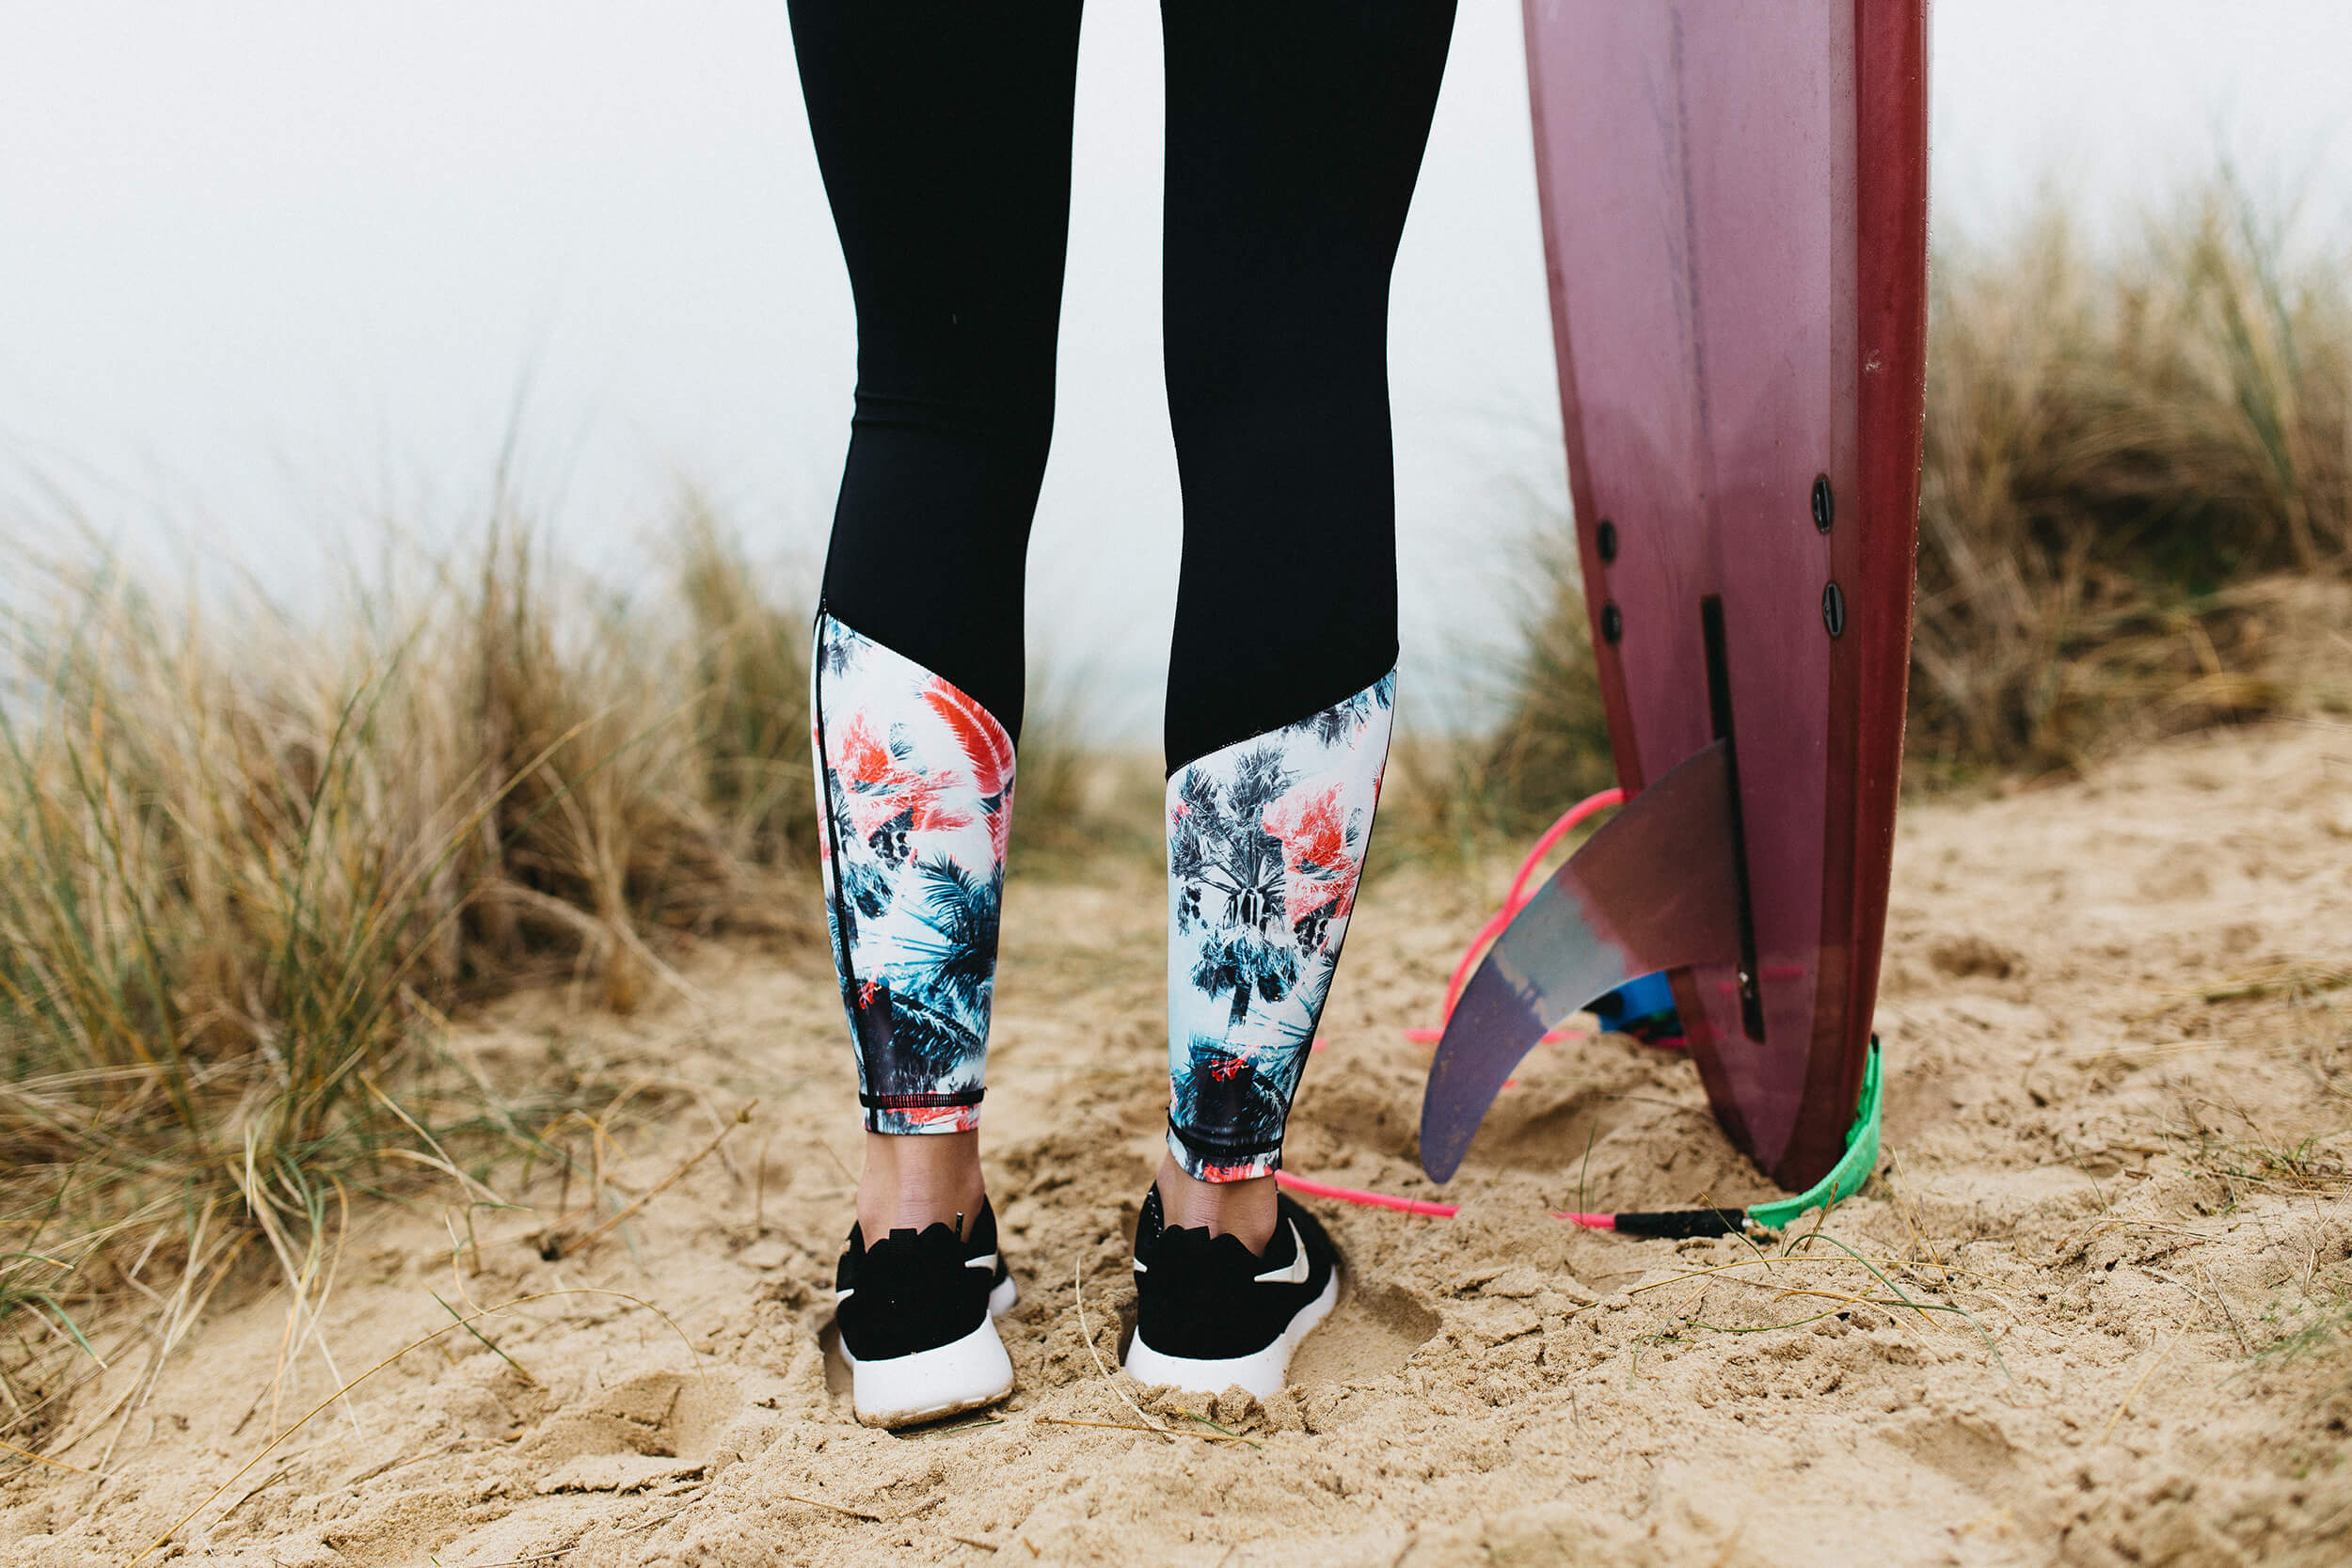 Surf / Yoga Leggings - £60